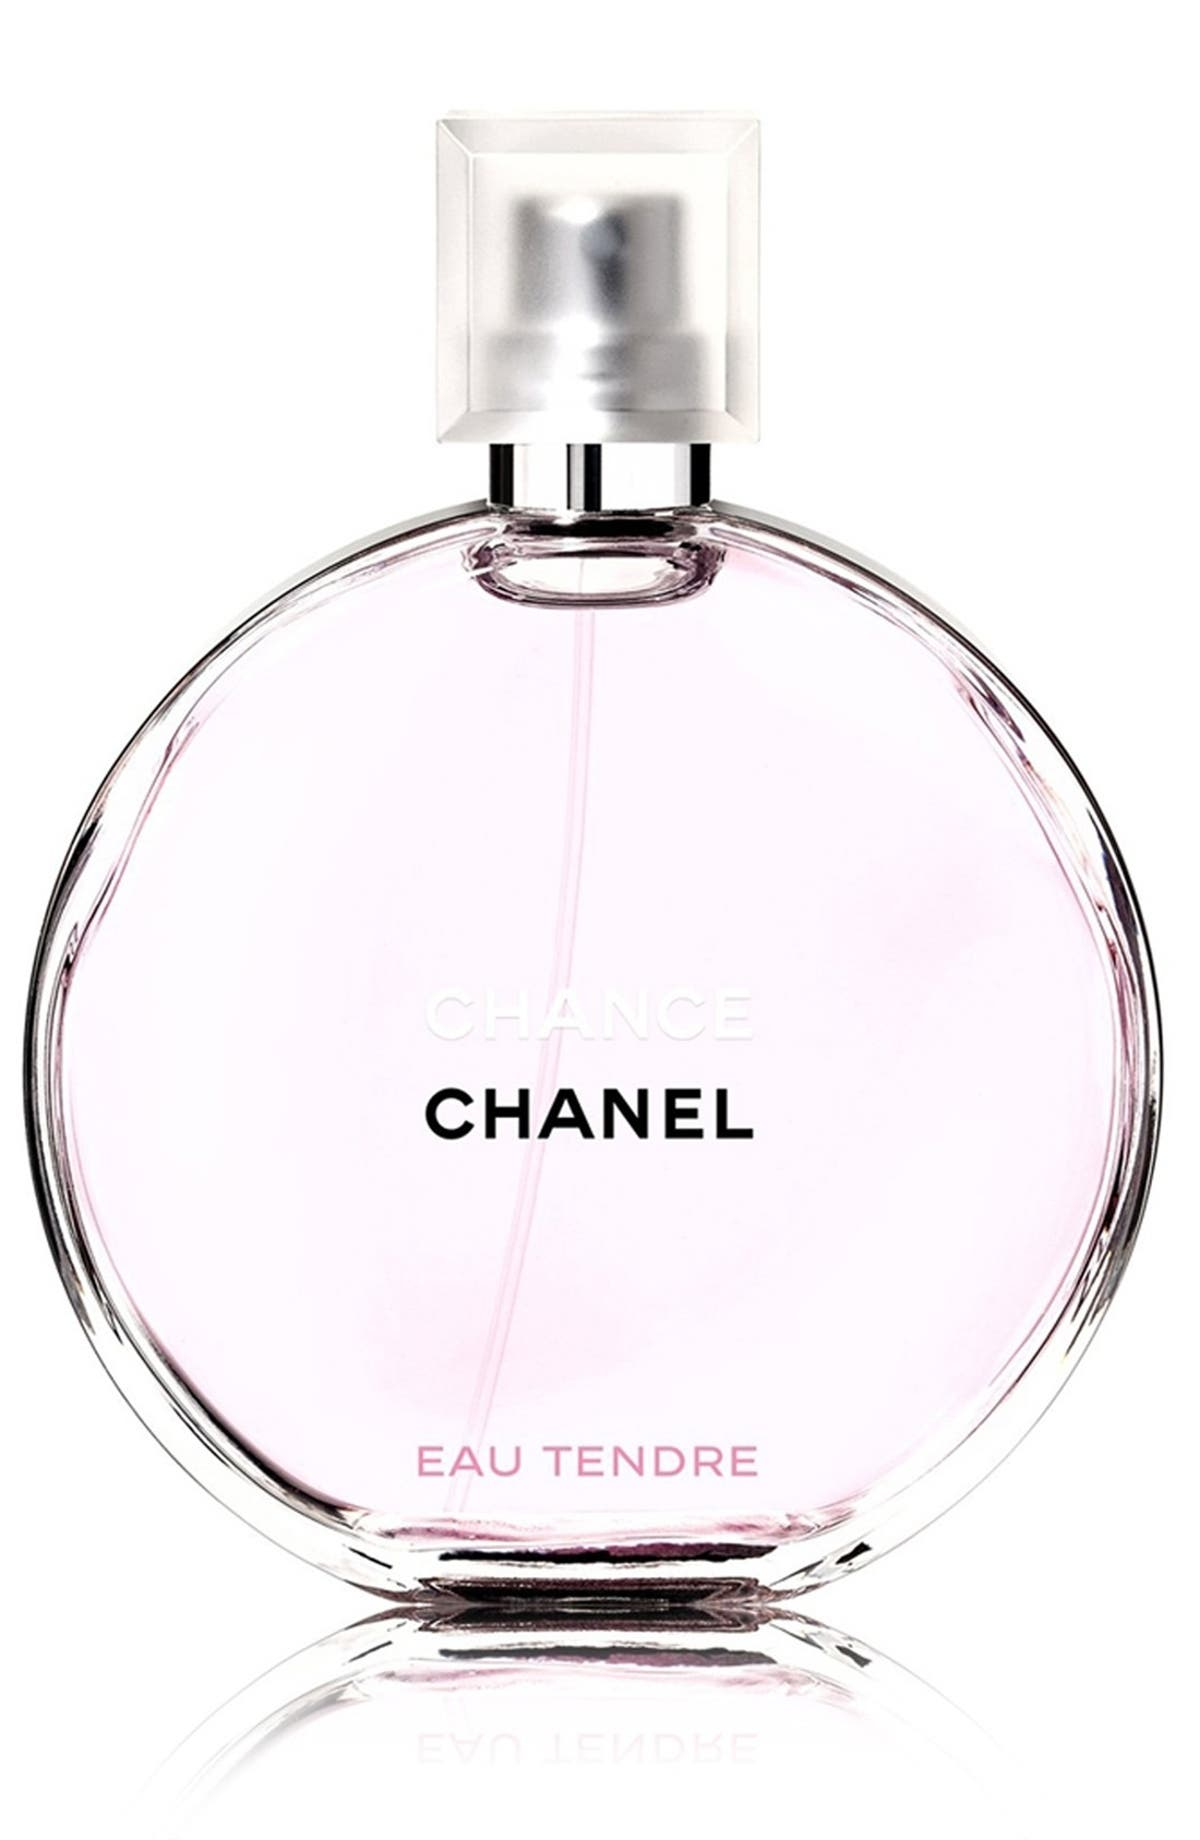 Chanel Chance Eau Tendre De Toilette Spray Nordstrom No 5 Women Edp 100ml